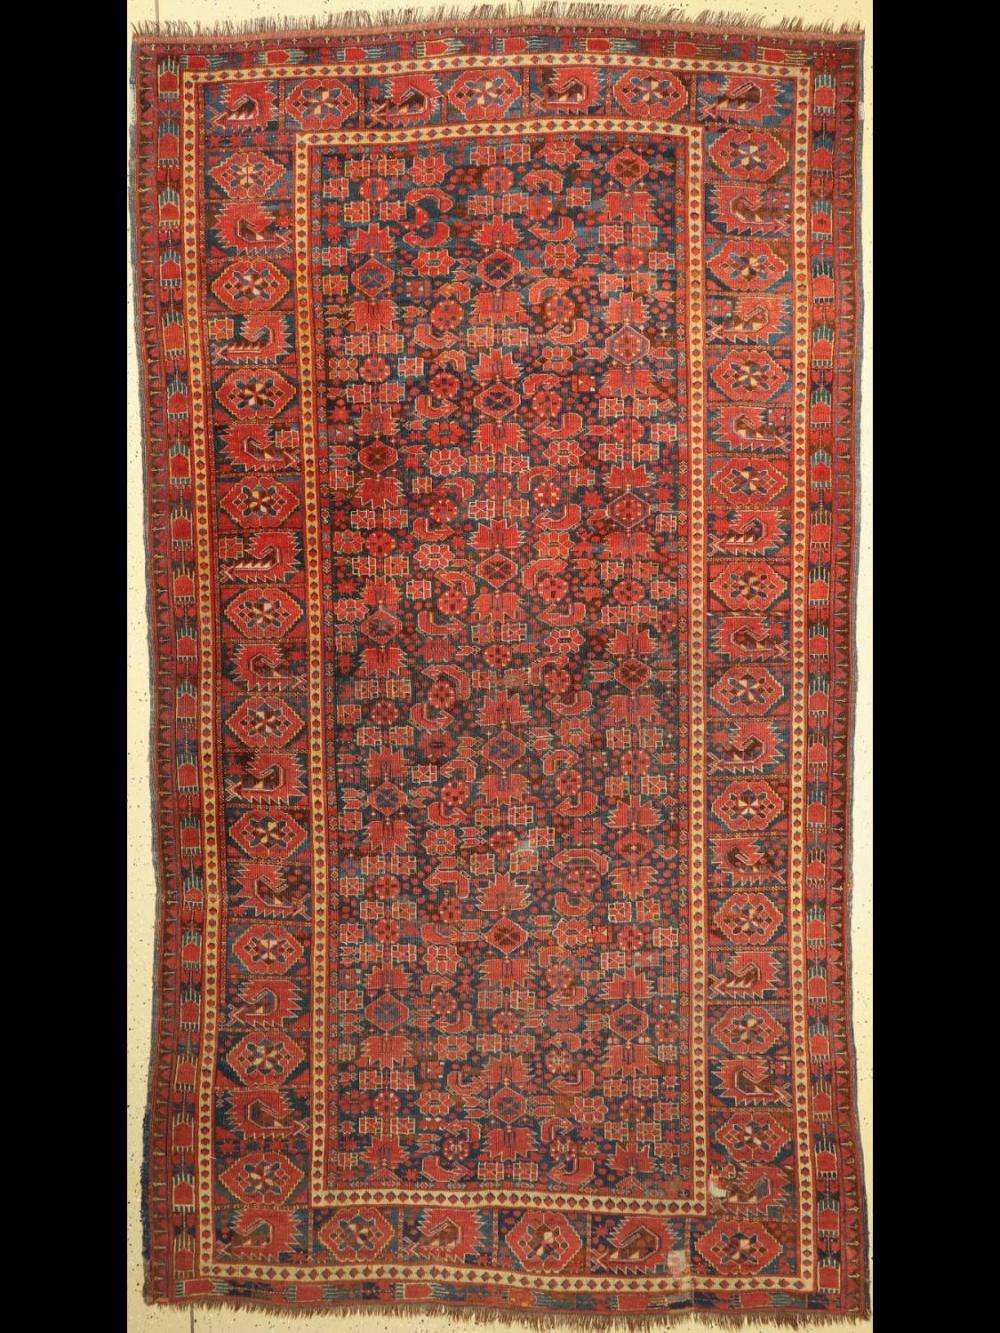 Beschir antique, Turkmenistan, late 19th century